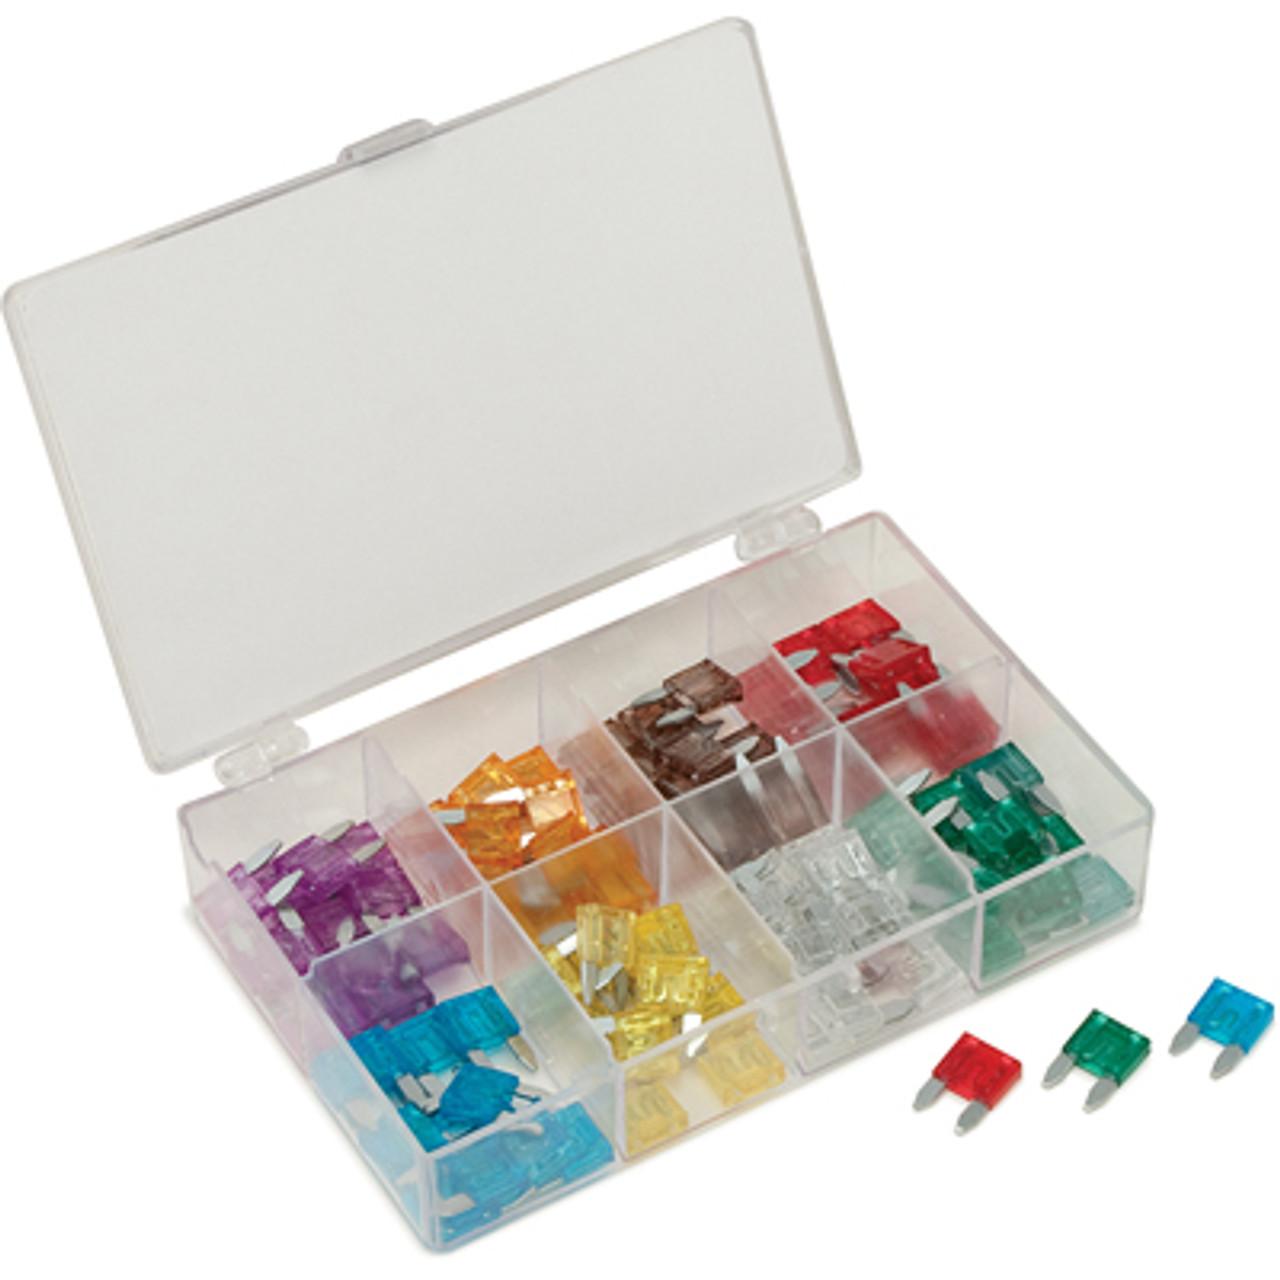 Titan Tools 45237 36 Piece Low Profile Mini Fuse Assortment